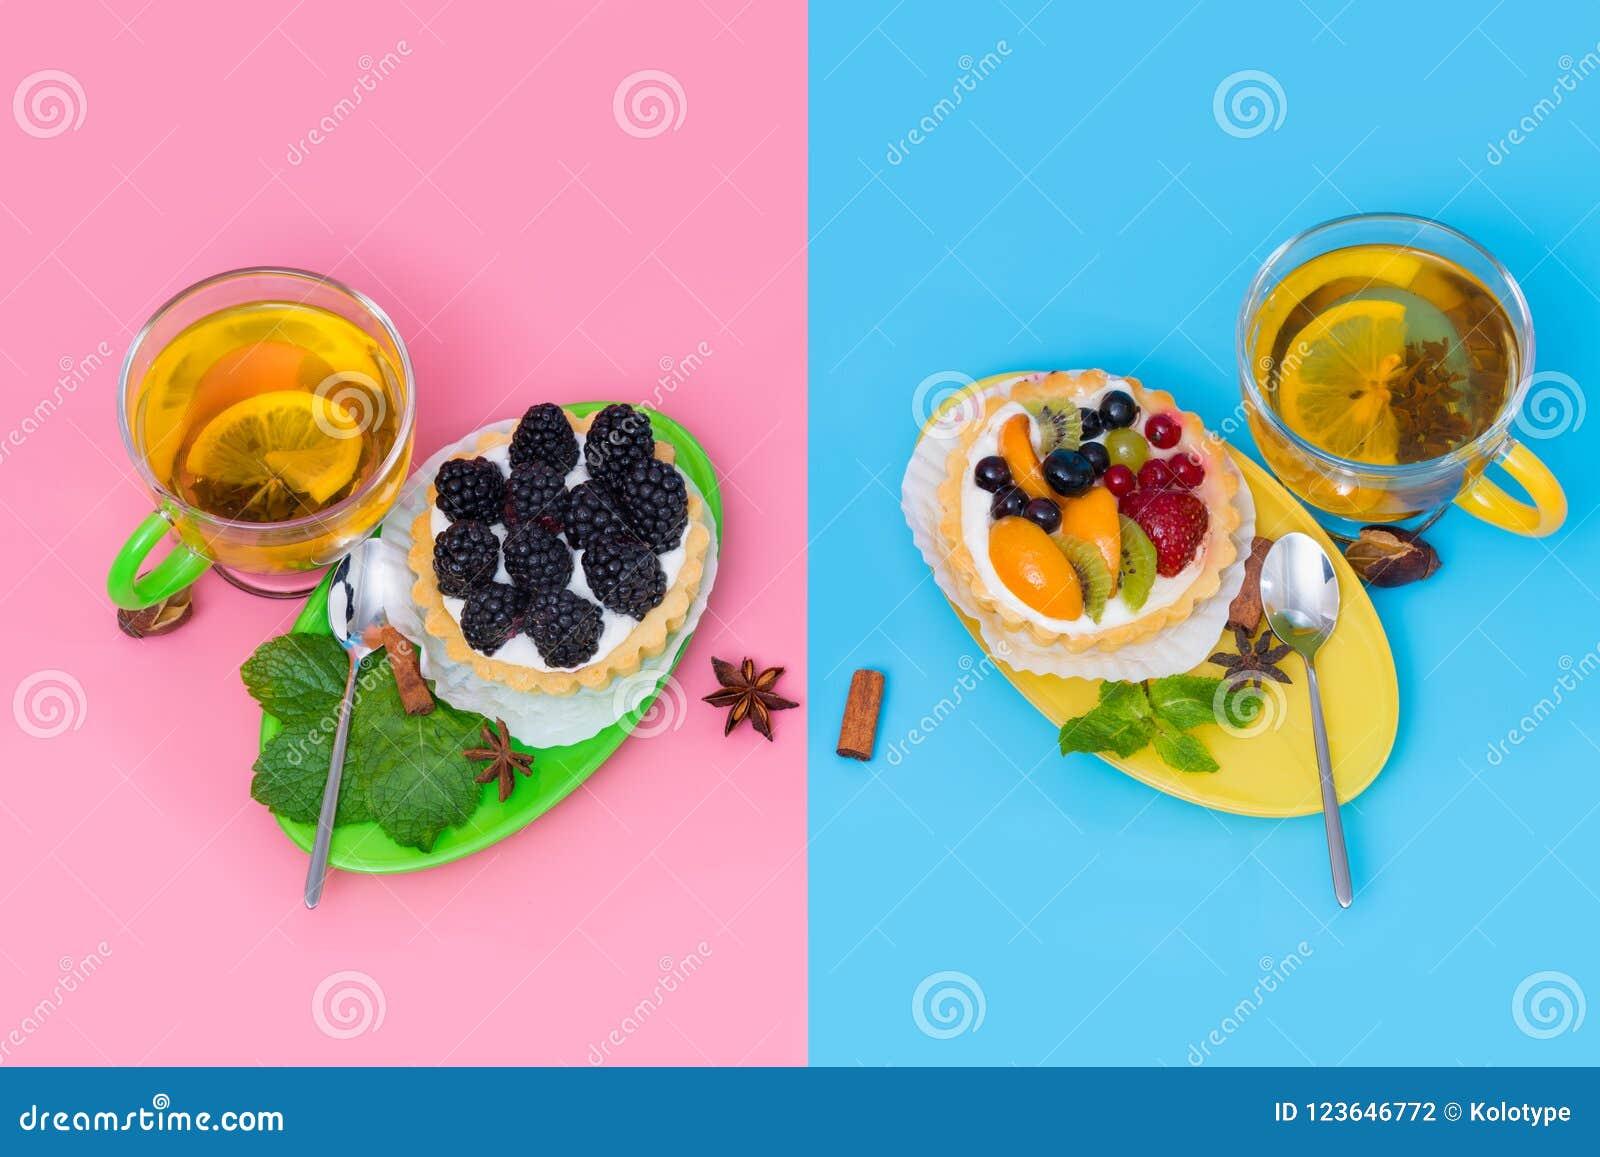 Hot spicy lemon tea served with fruit tarts